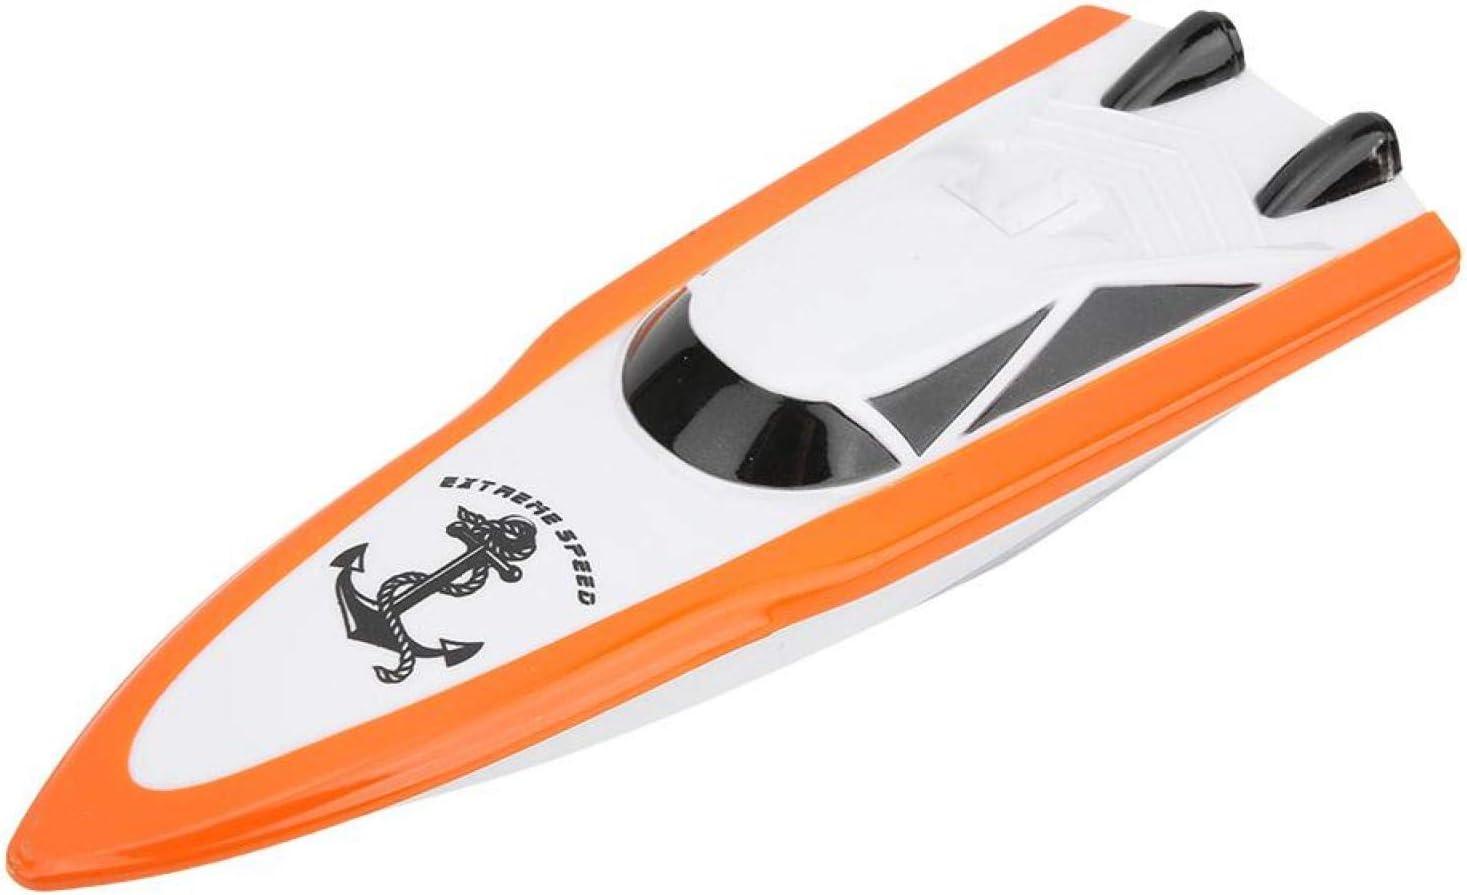 Qqmora Efficient Conversion Mini Rc Model Size Cultiva 40% OFF Cheap Sale Boat Inexpensive